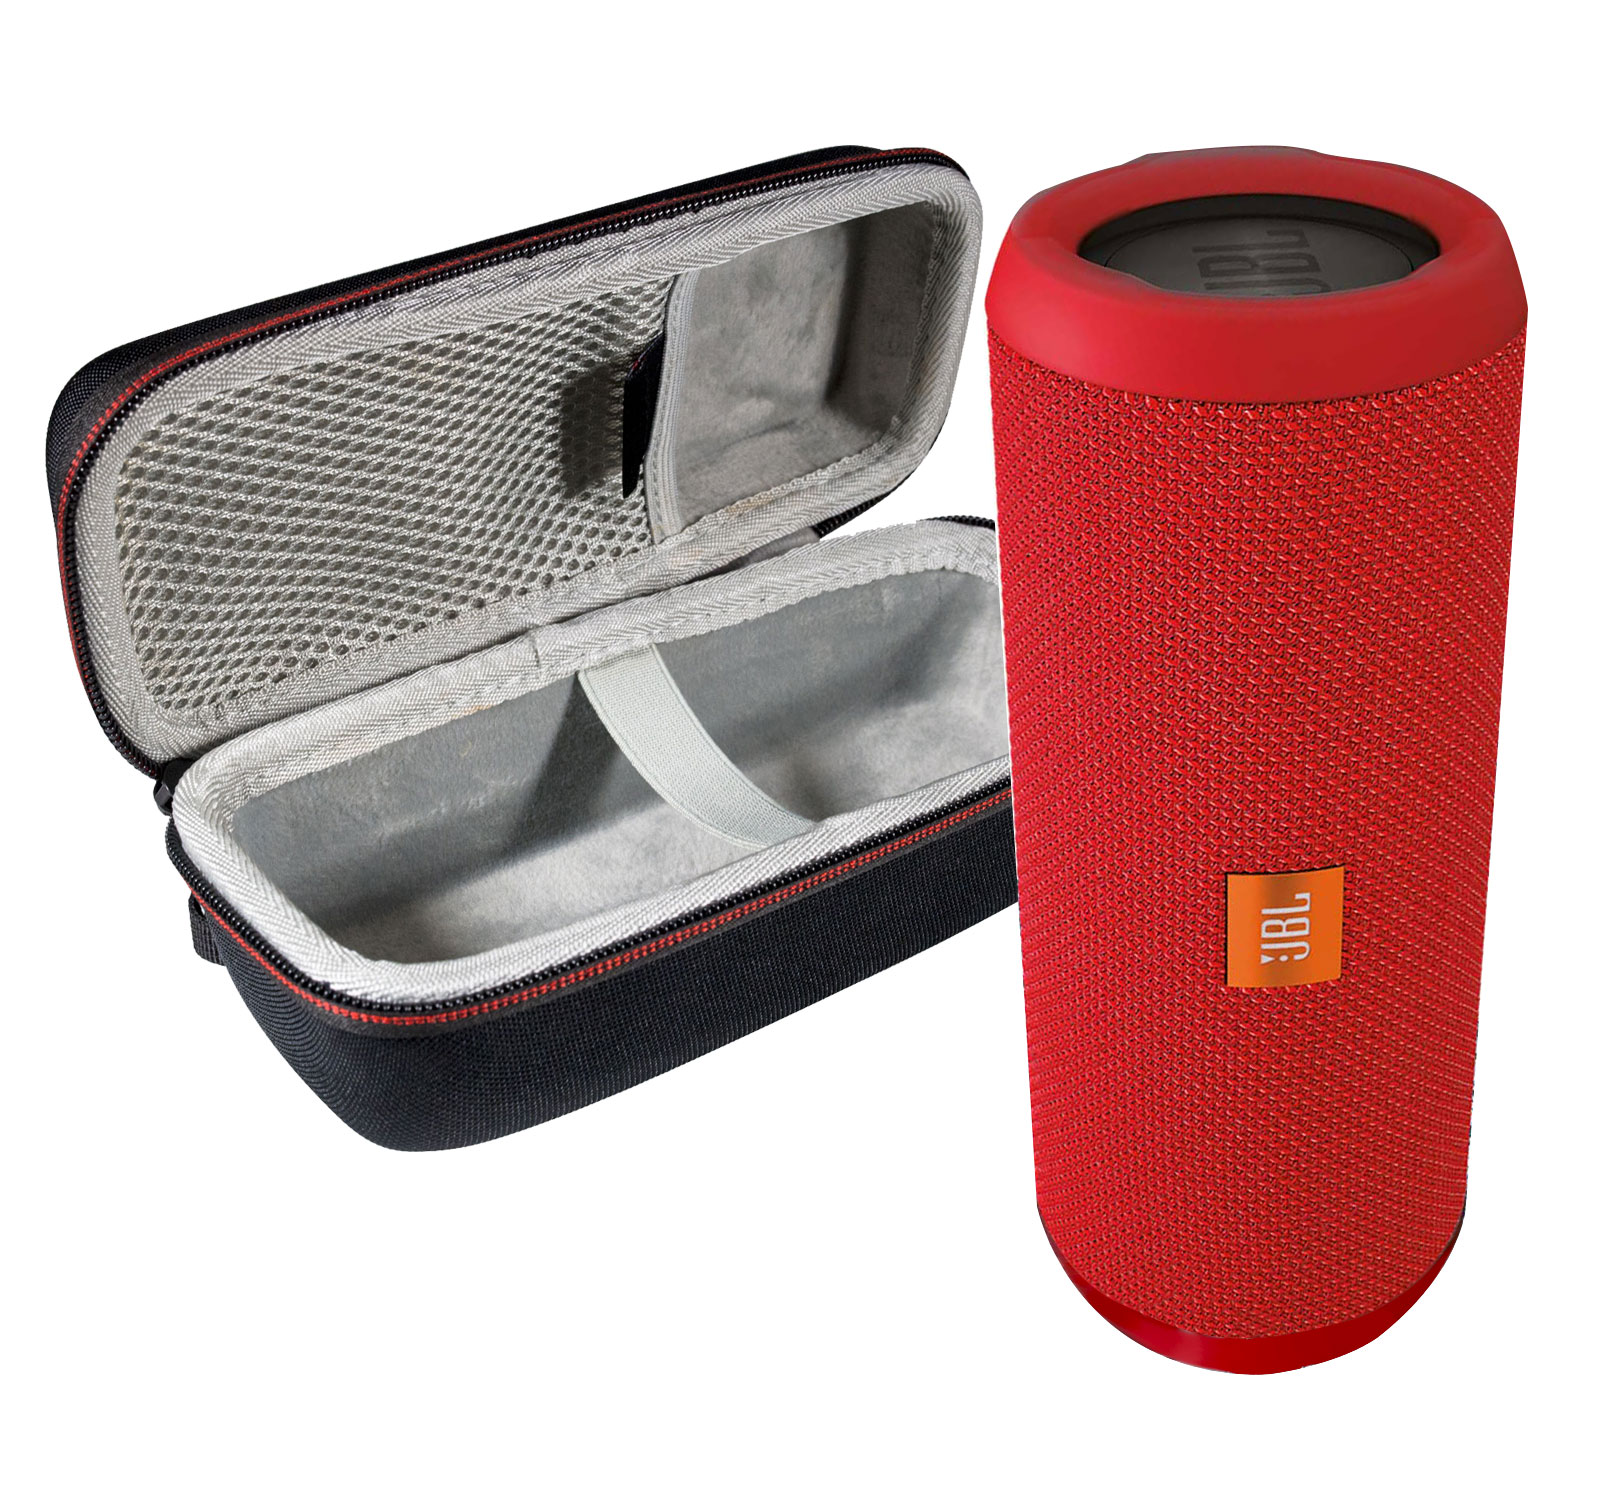 JBL FLIP 3 Red Portable BT Speaker w/Case